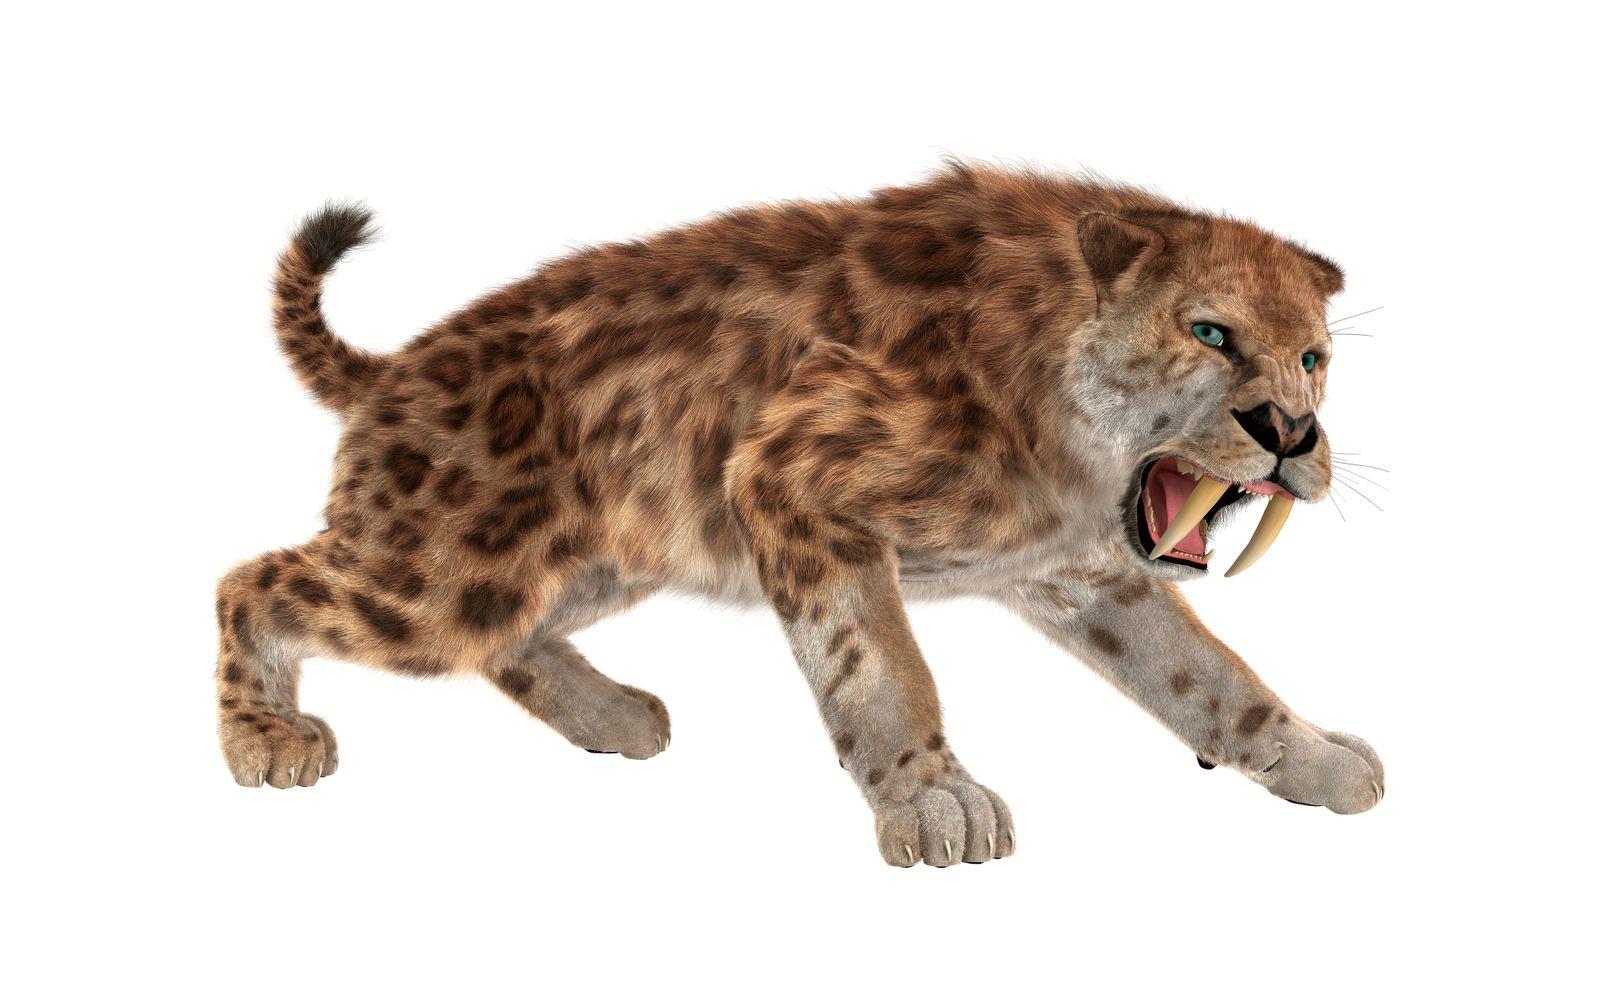 3D rendering sabertooth tiger on white